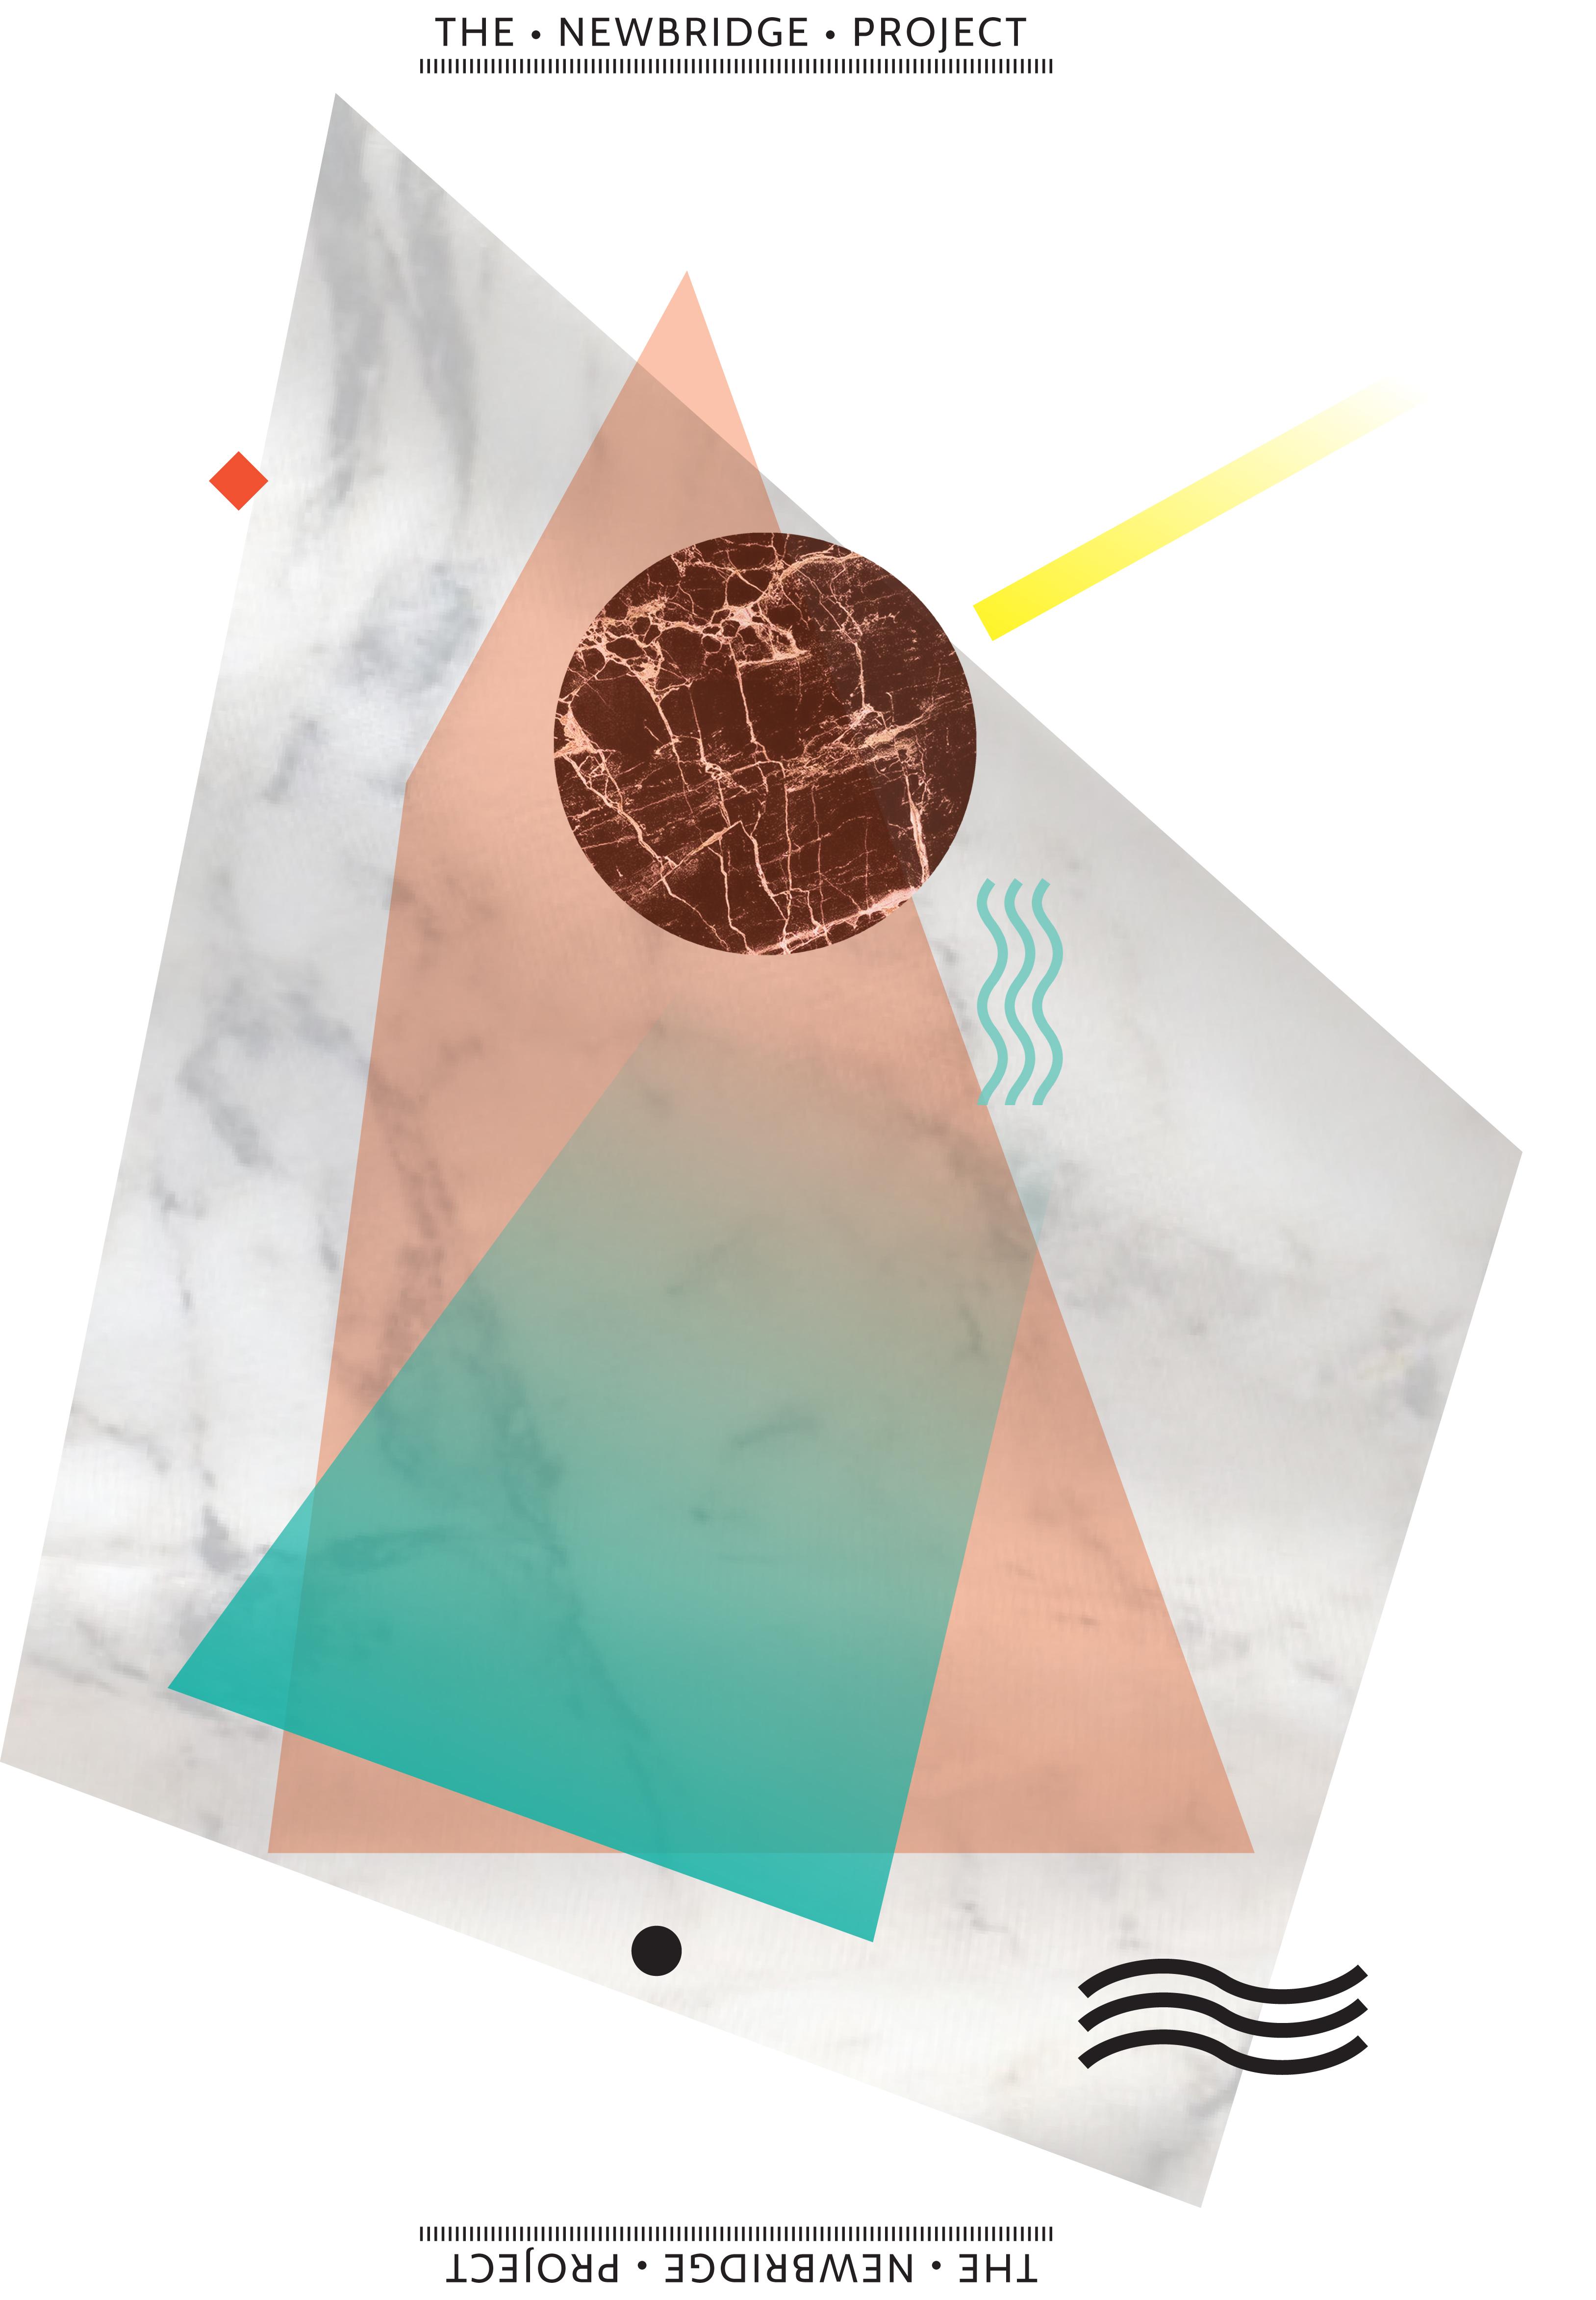 seapunkfront image